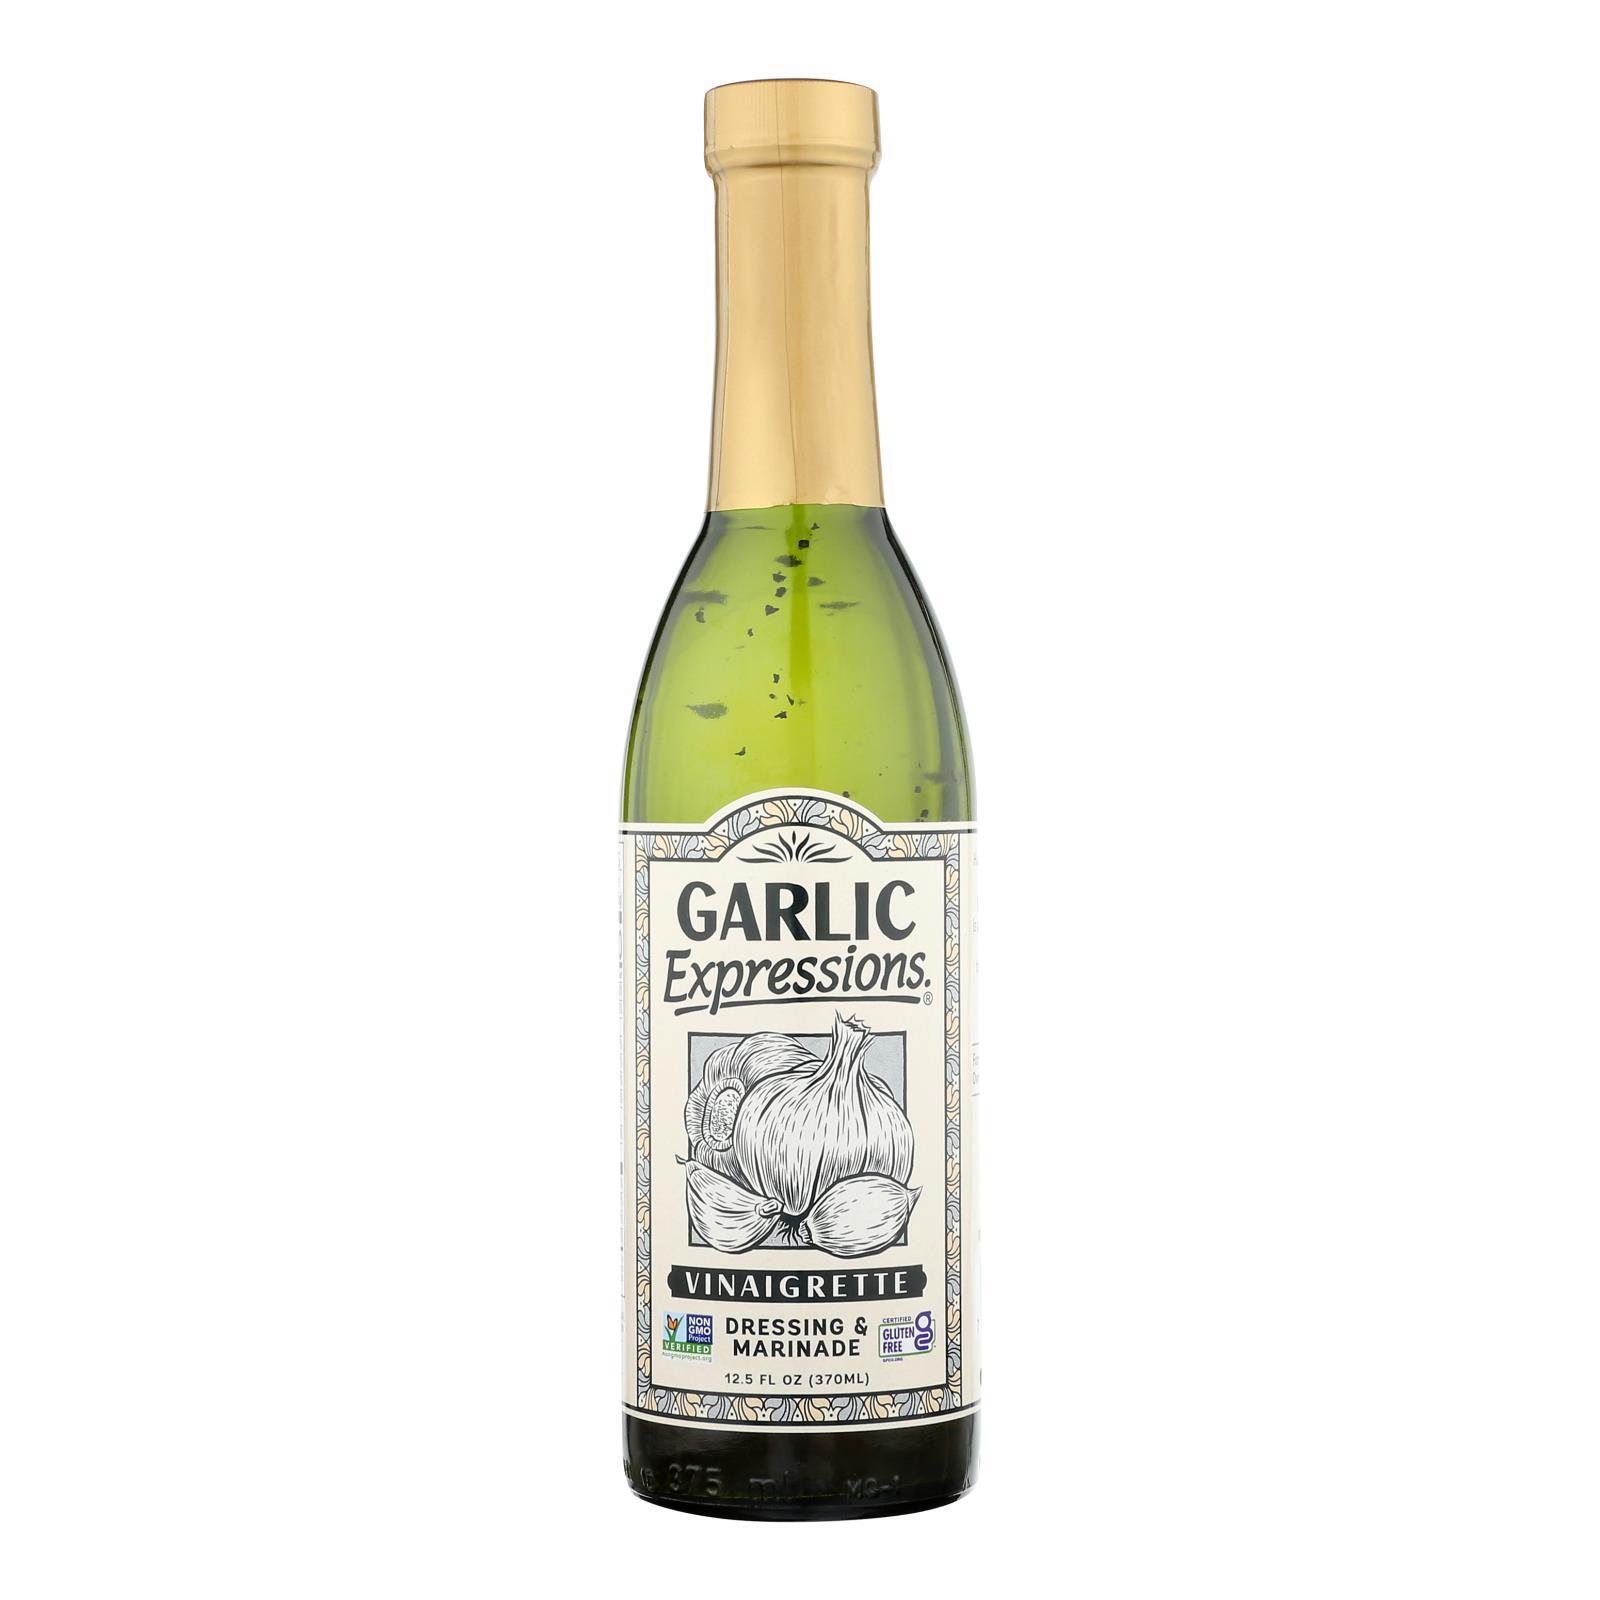 Garlic Expressions Salad Dressing - Vinaigrete - Case of 12 - 12.5 oz